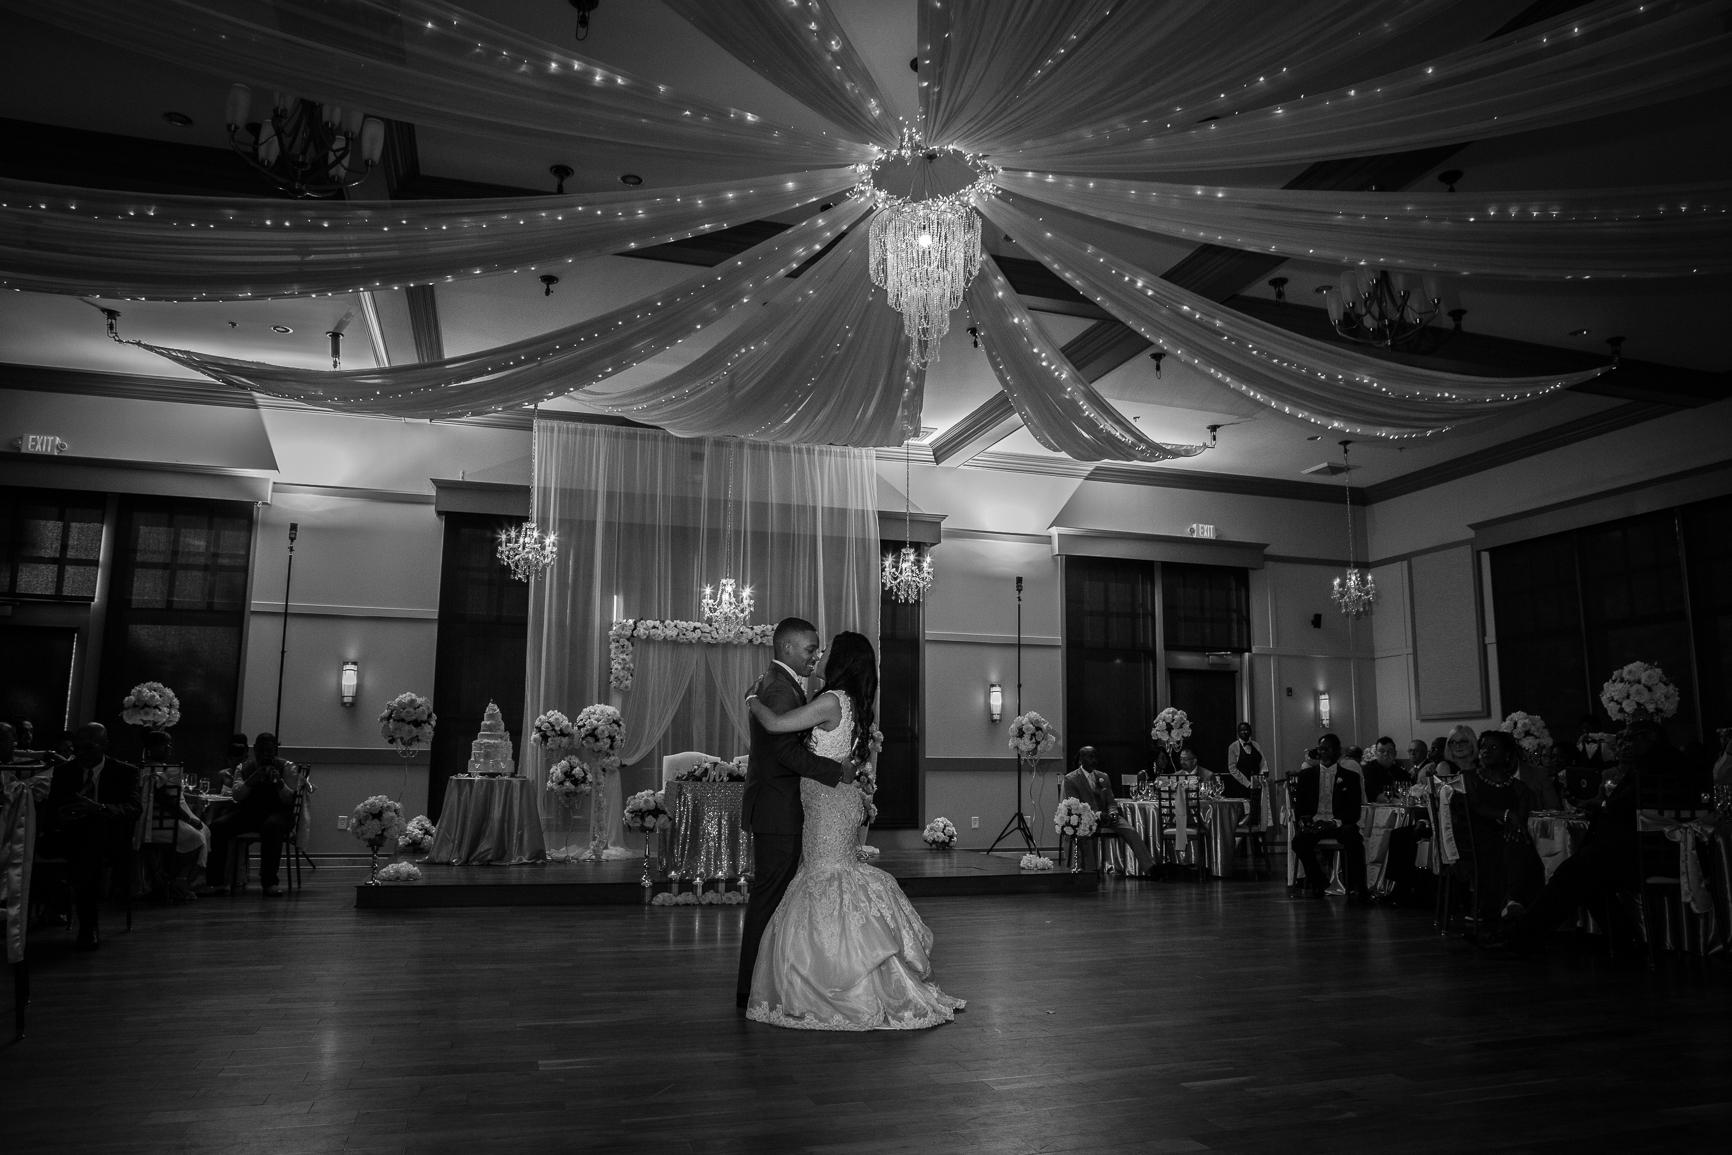 Noah's Morrisville wedding venue photographer - 101 studio llc -21.jpg